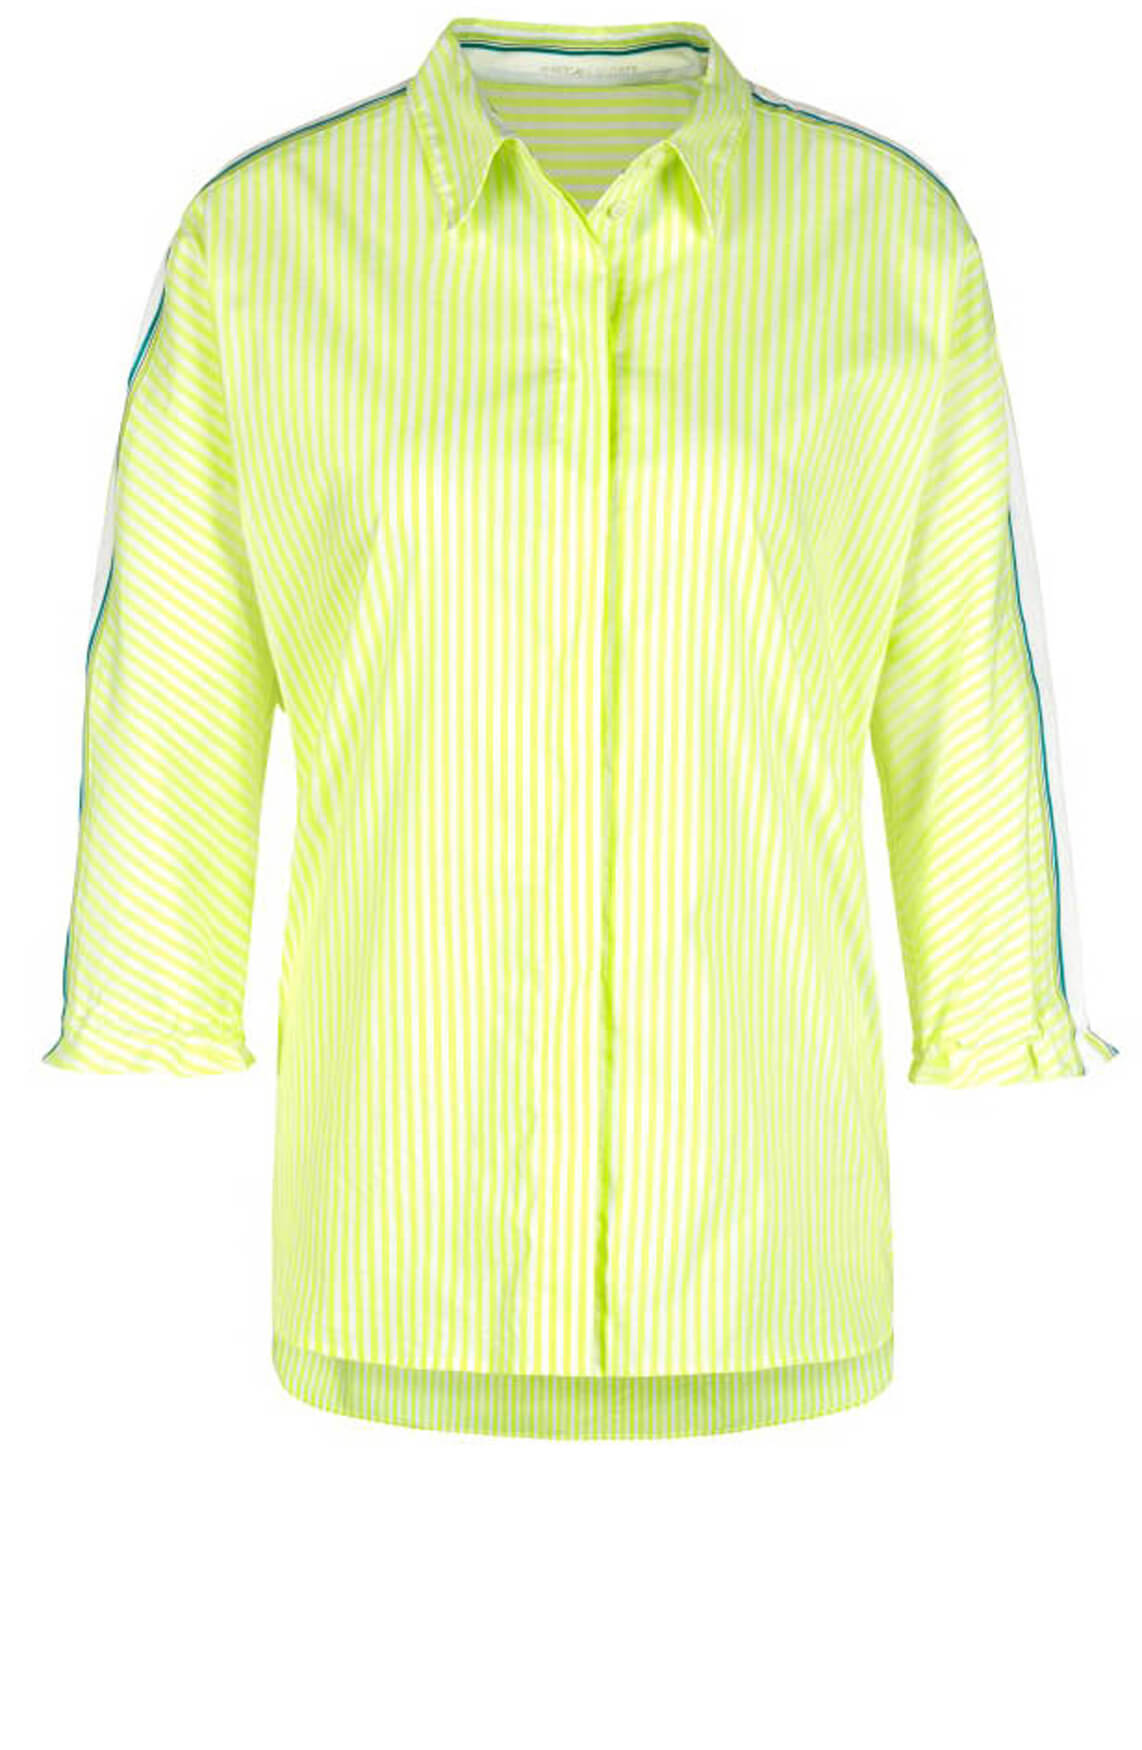 Marccain Sports Dames Sportieve blouse groen